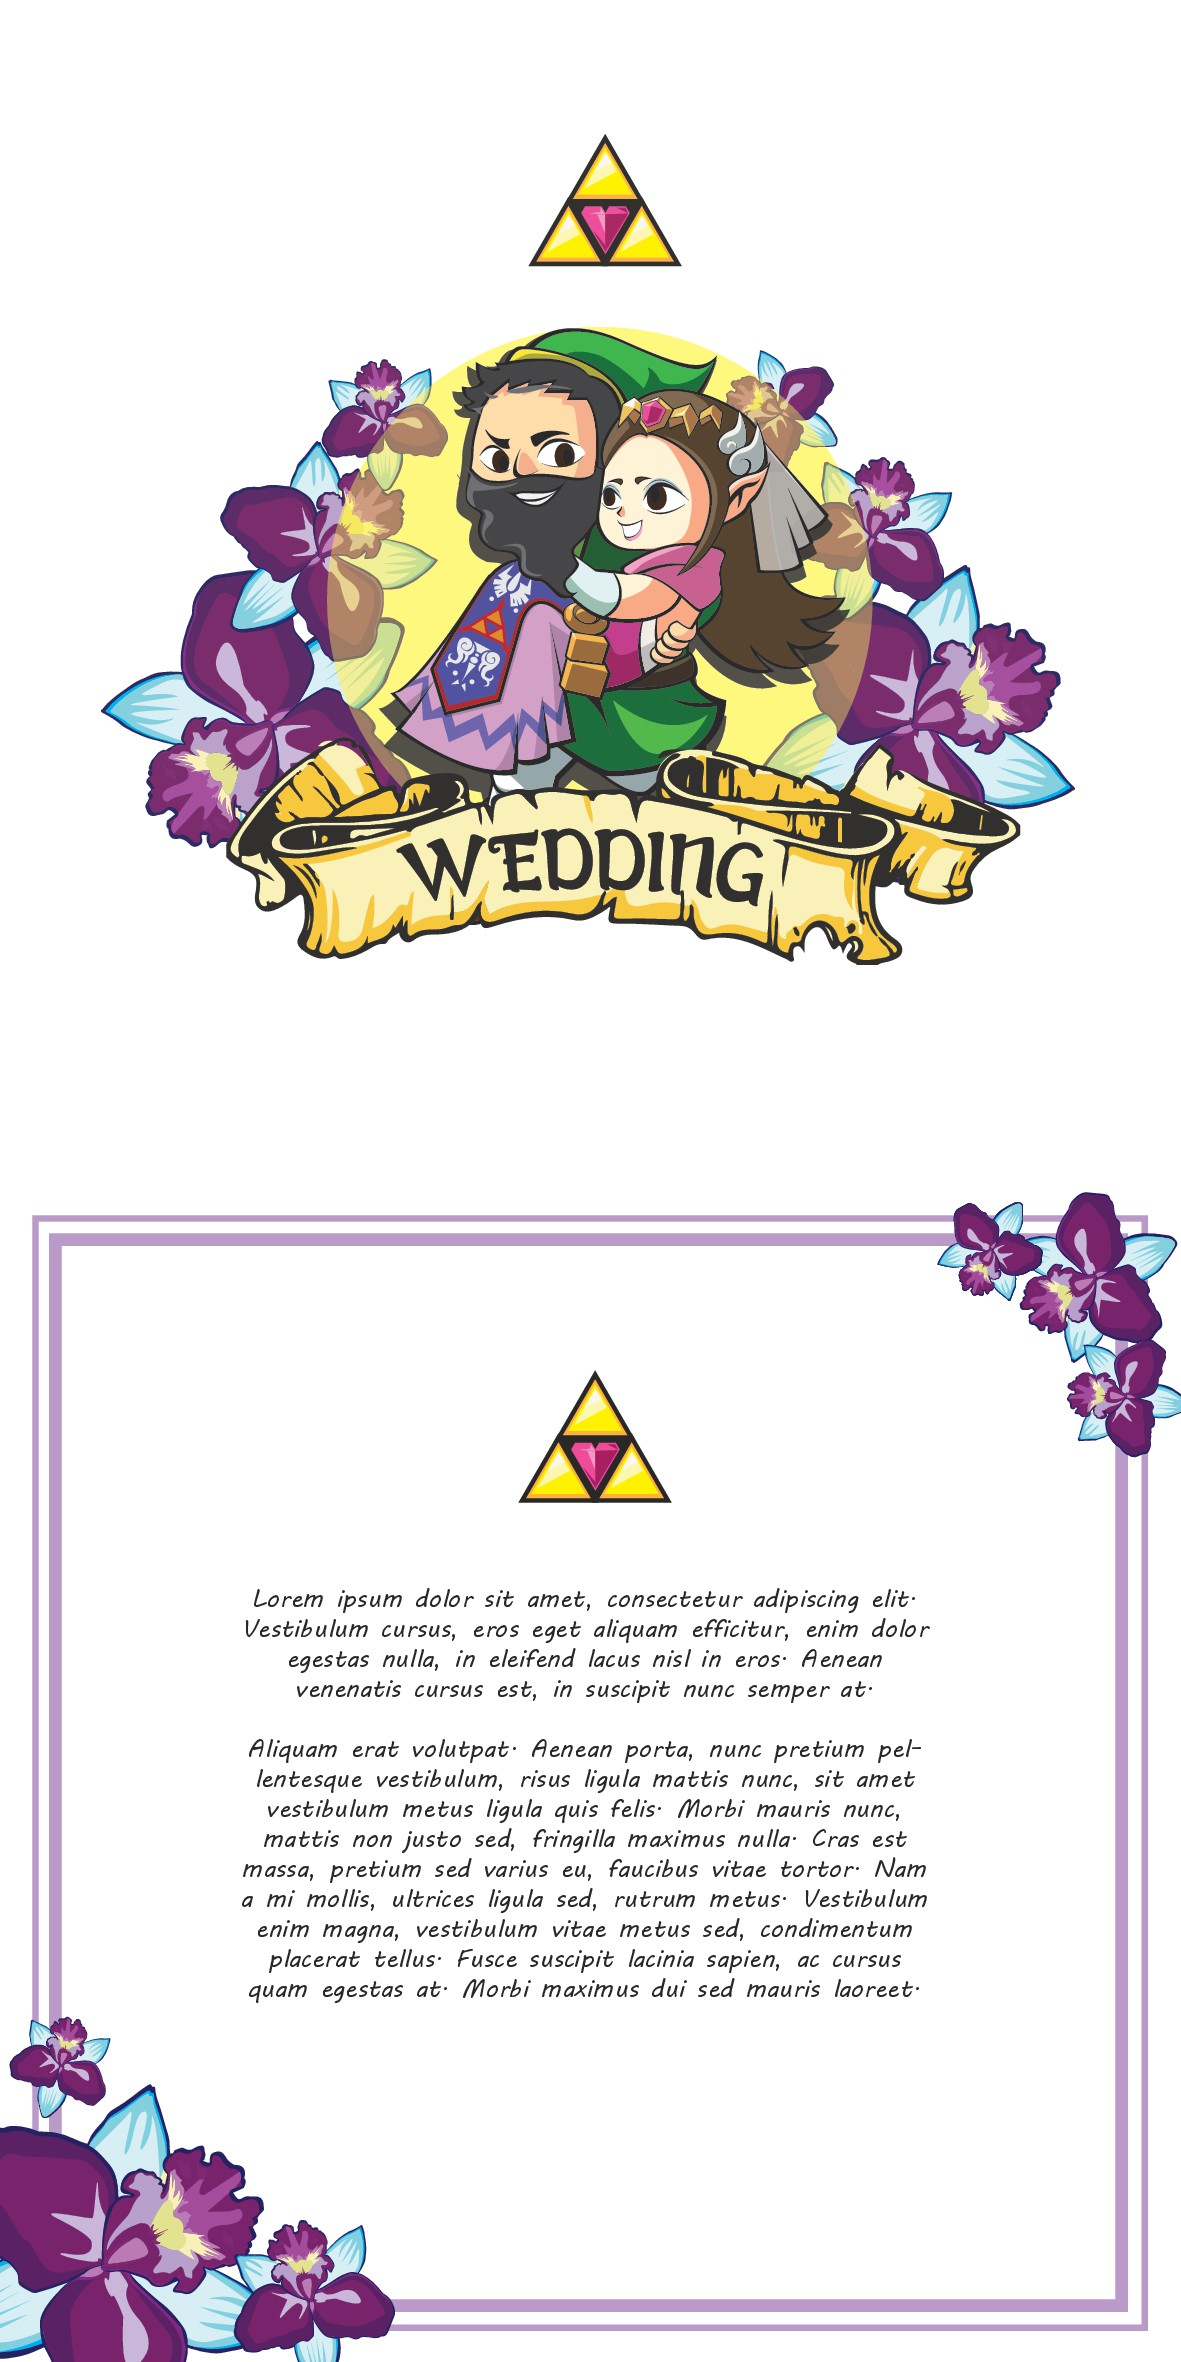 Videogame Inspired Wedding design